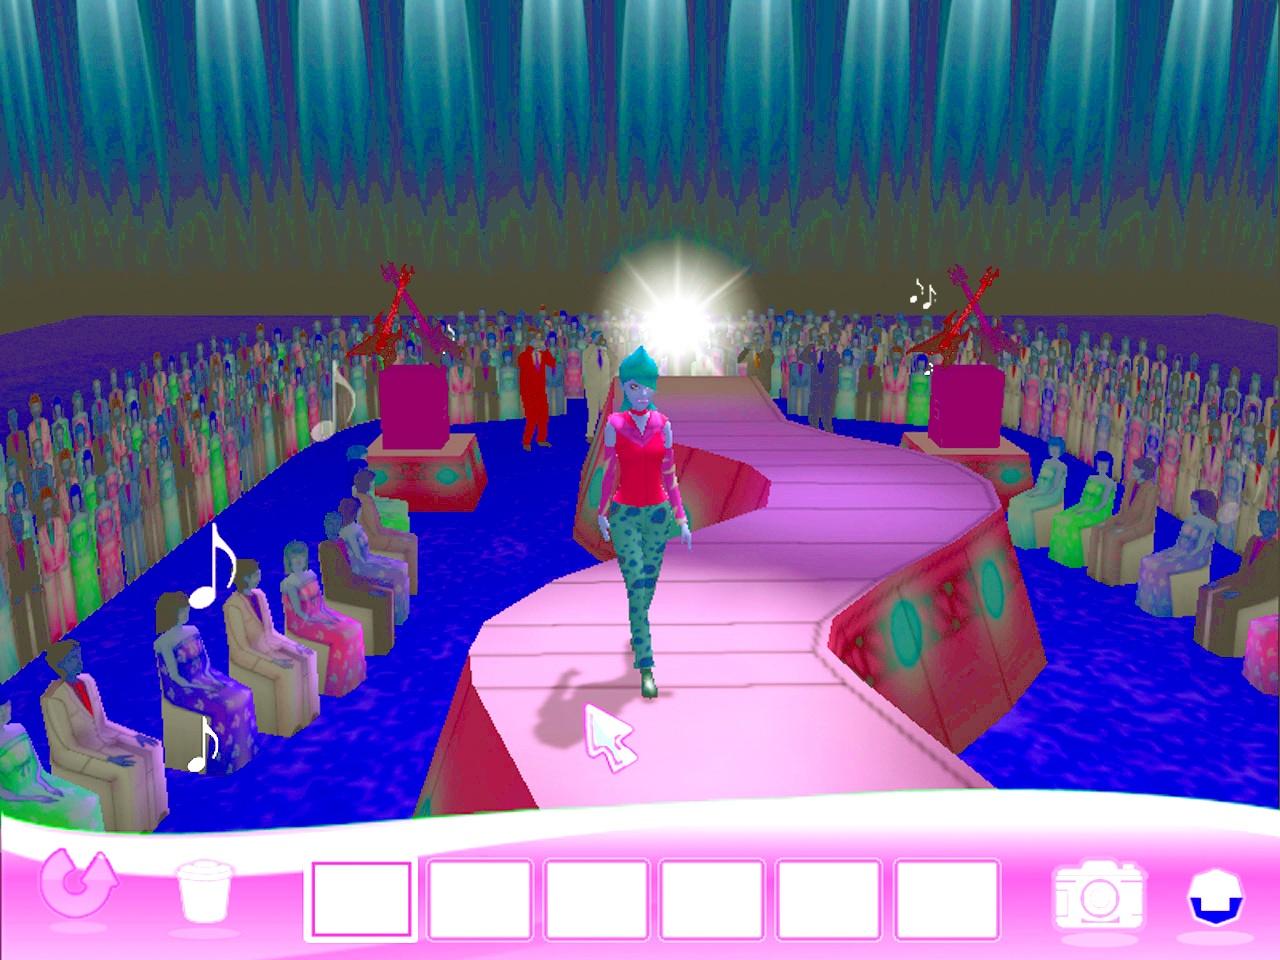 Fashion Designer - Free online games at m 29